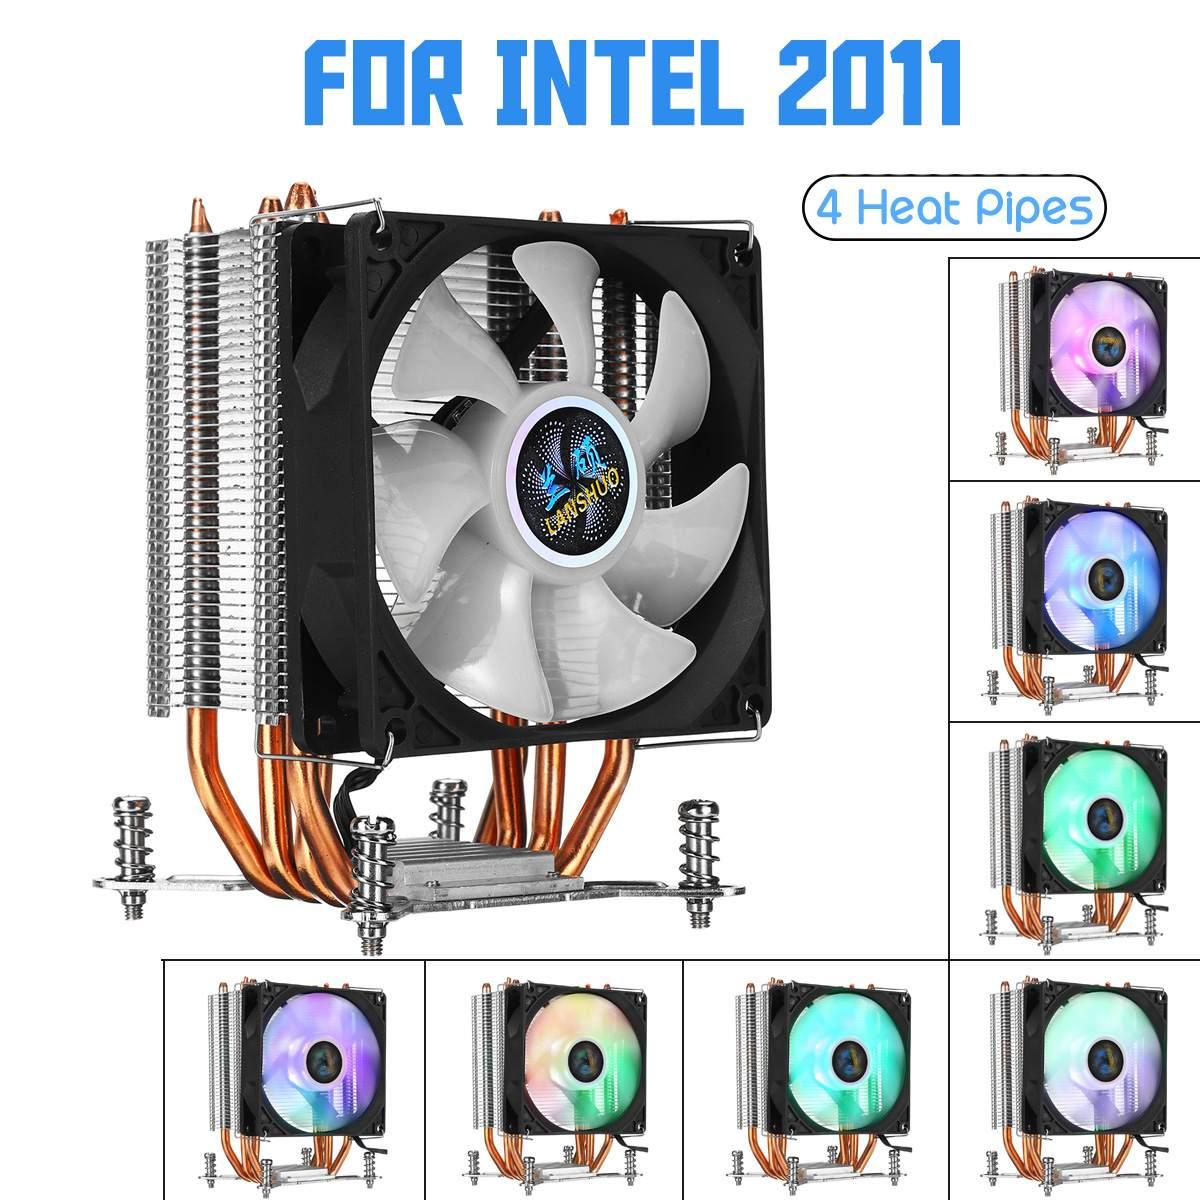 4 Copper Heatpipe CPU Cooler For Aurora Light Cooling Fan 90mm With RGB For Intel LGA 2011 CPU Cooler Heatsink Radiator